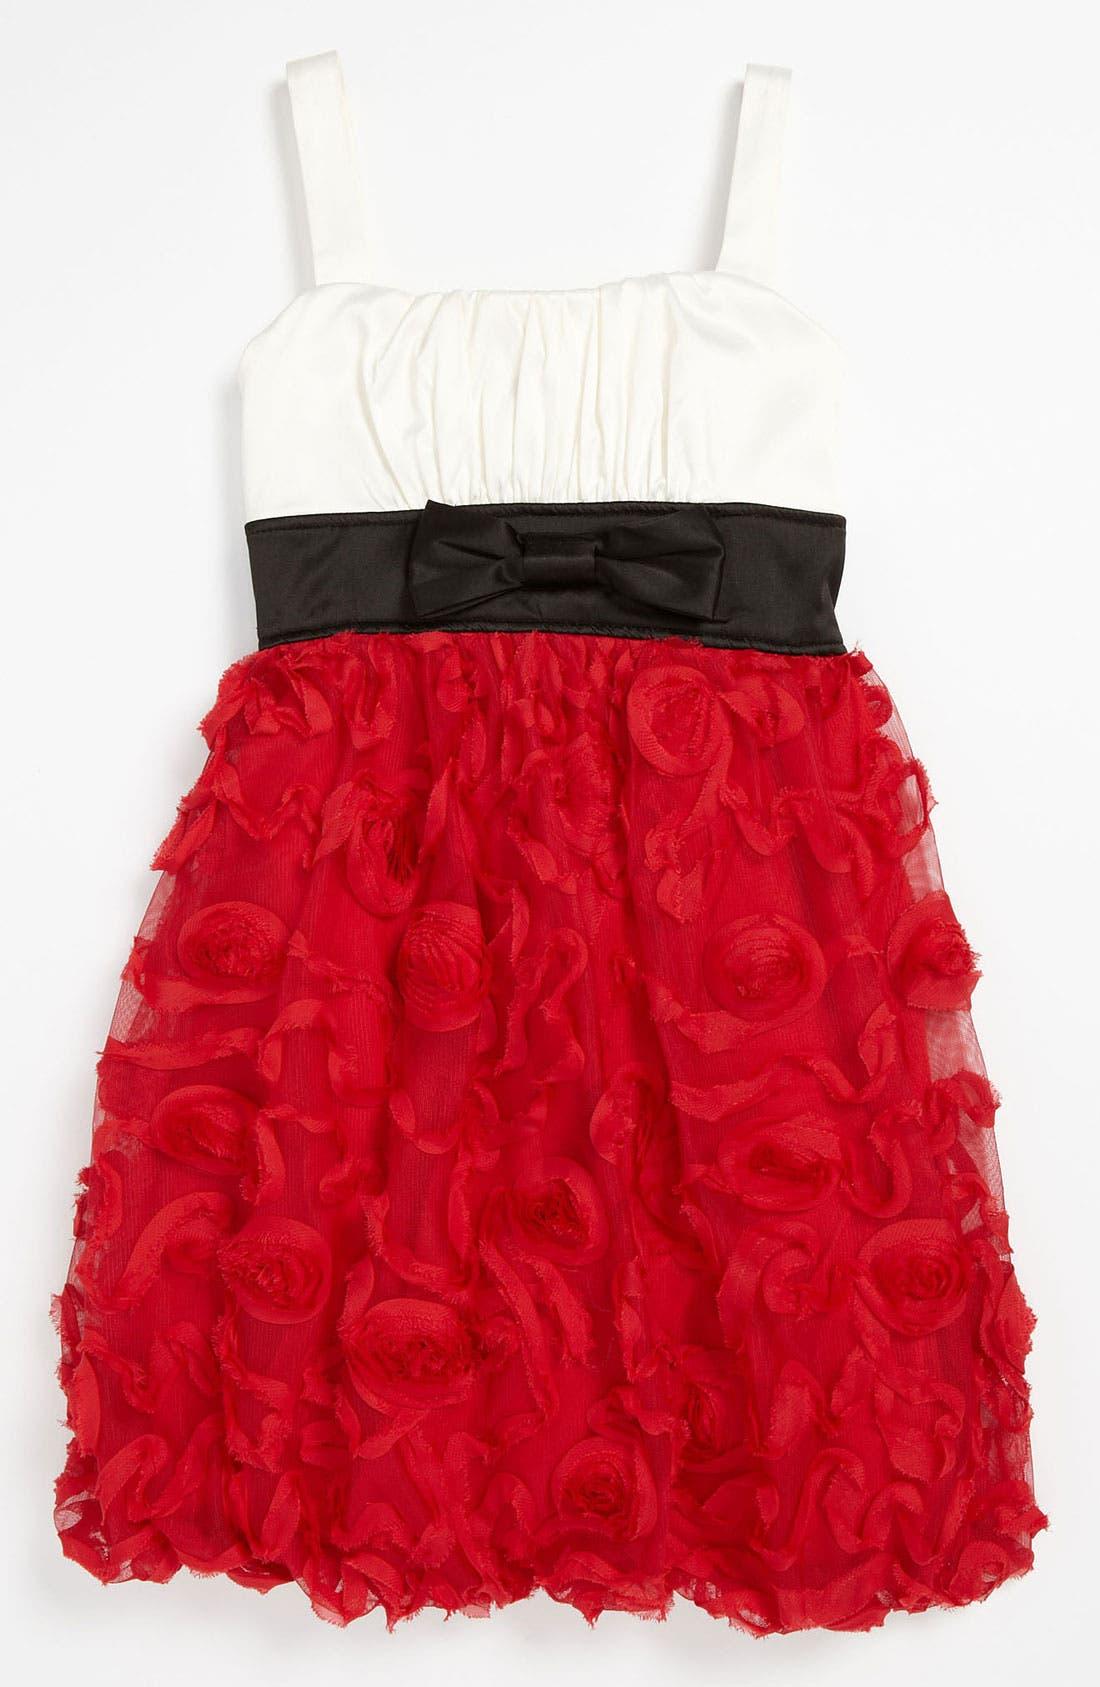 Alternate Image 1 Selected - Roxette Colorblock Soutache Dress (Little Girls & Big Girls)